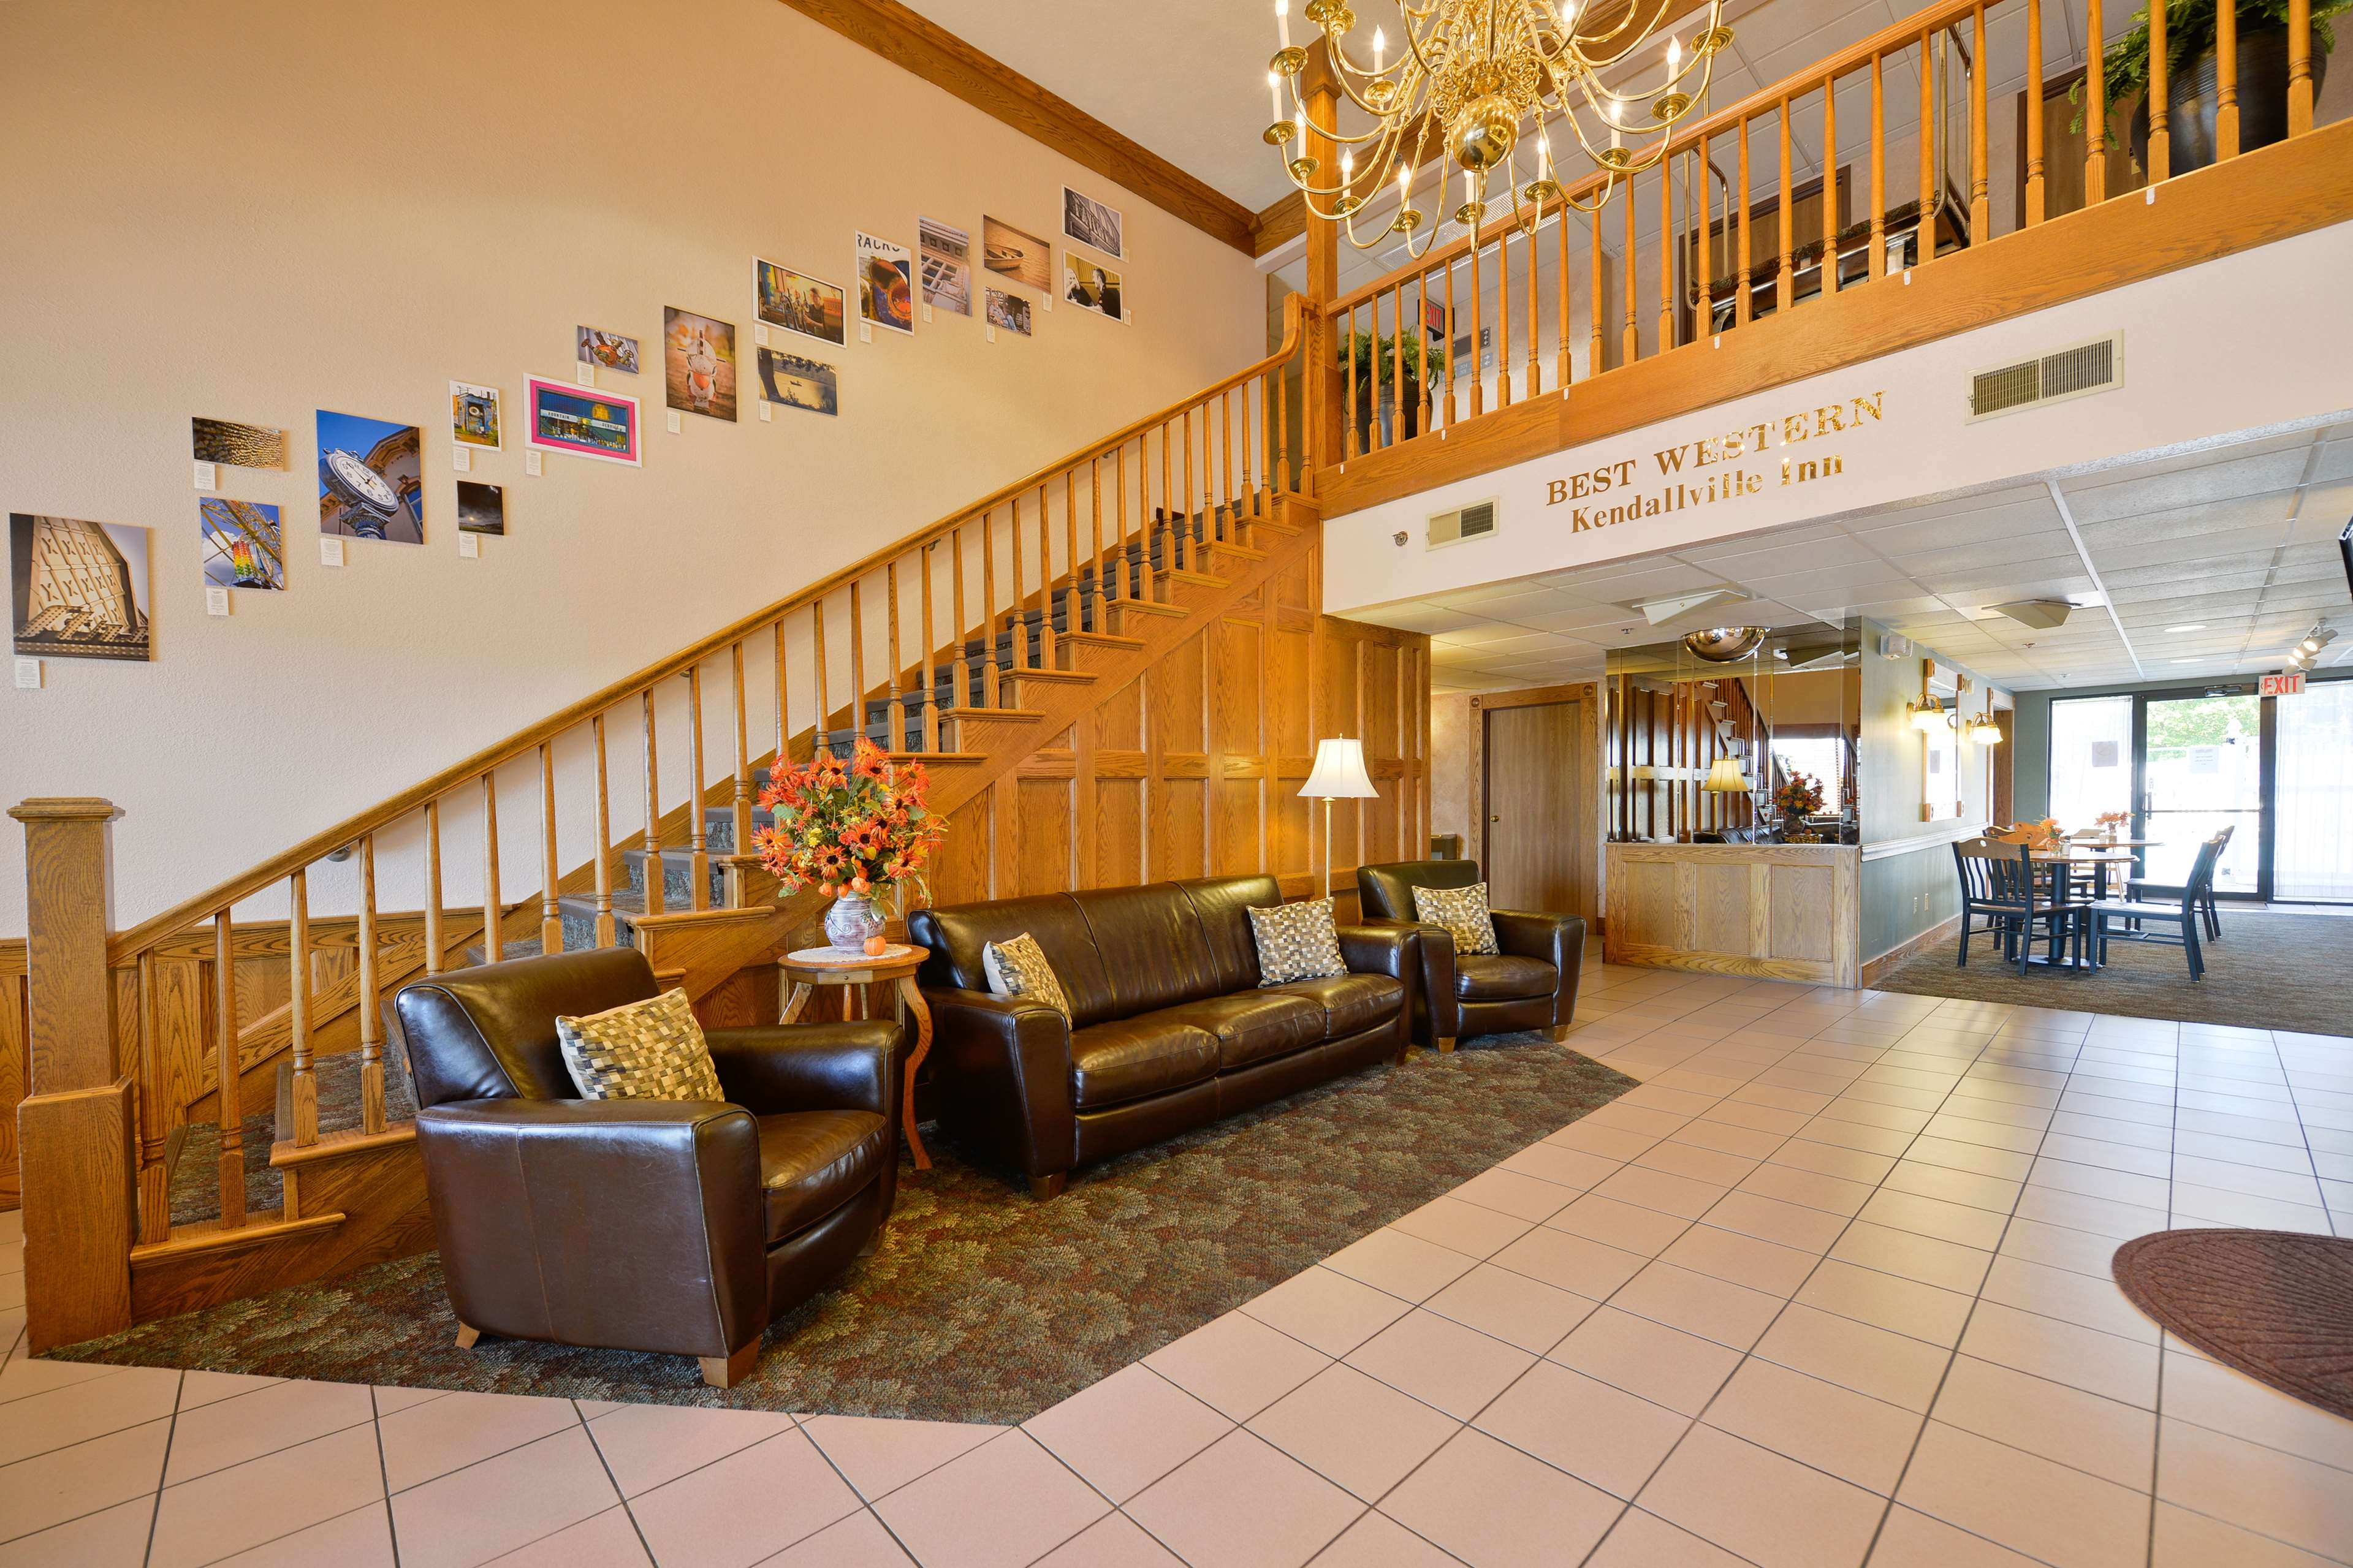 Best Western Kendallville Inn image 18